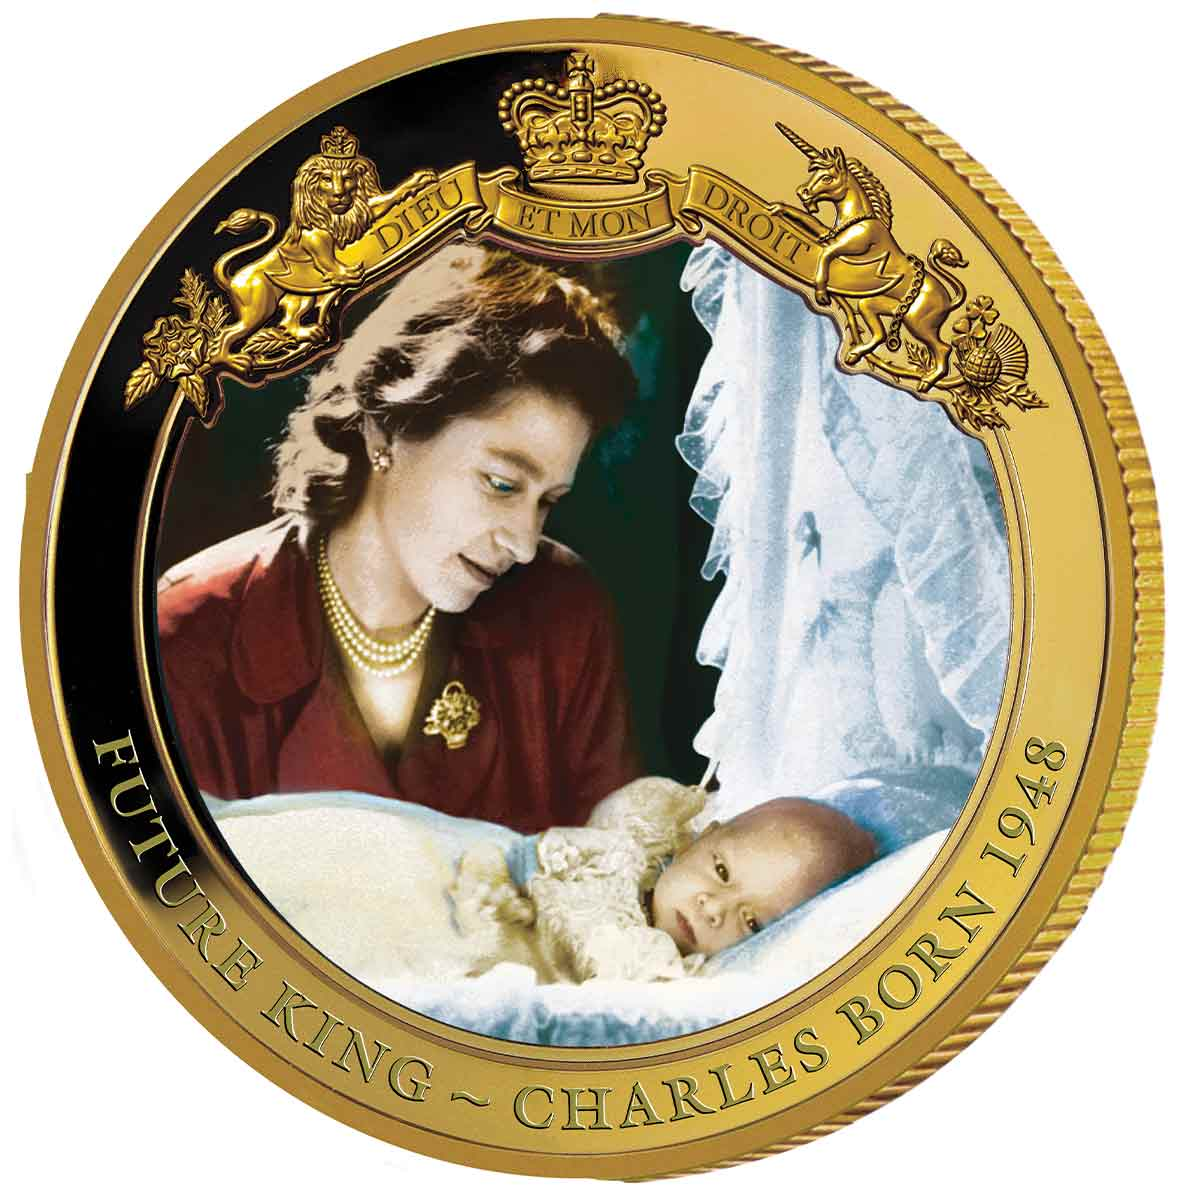 Birth of Prince Charles